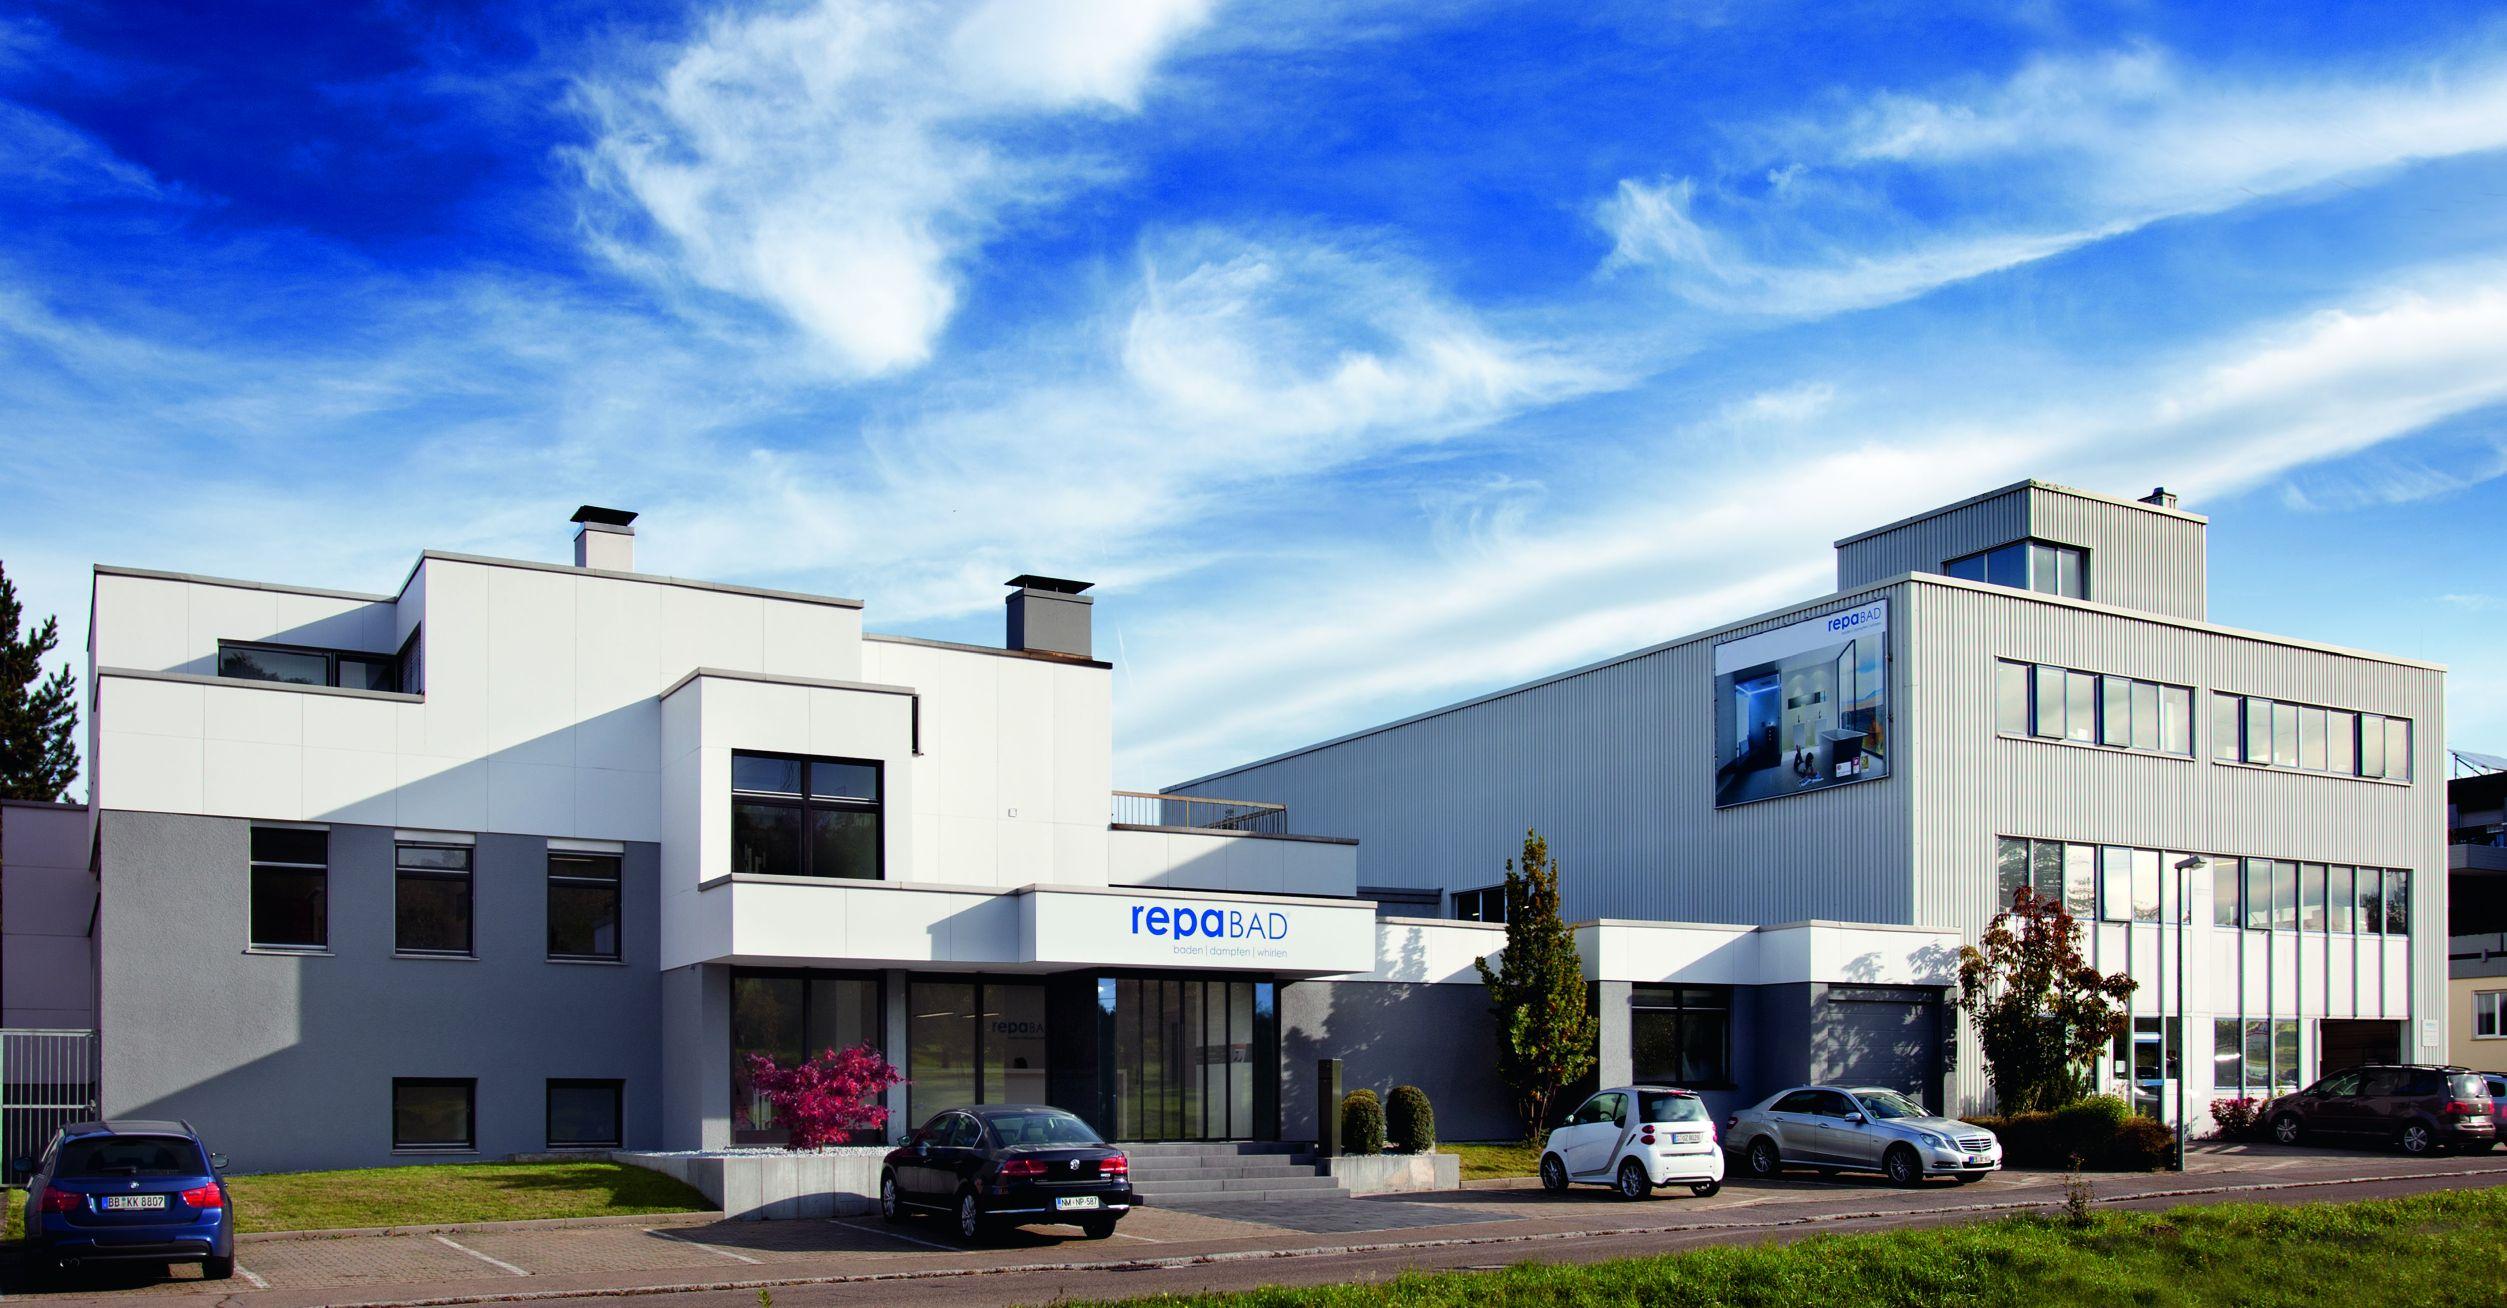 Repabad GmbH